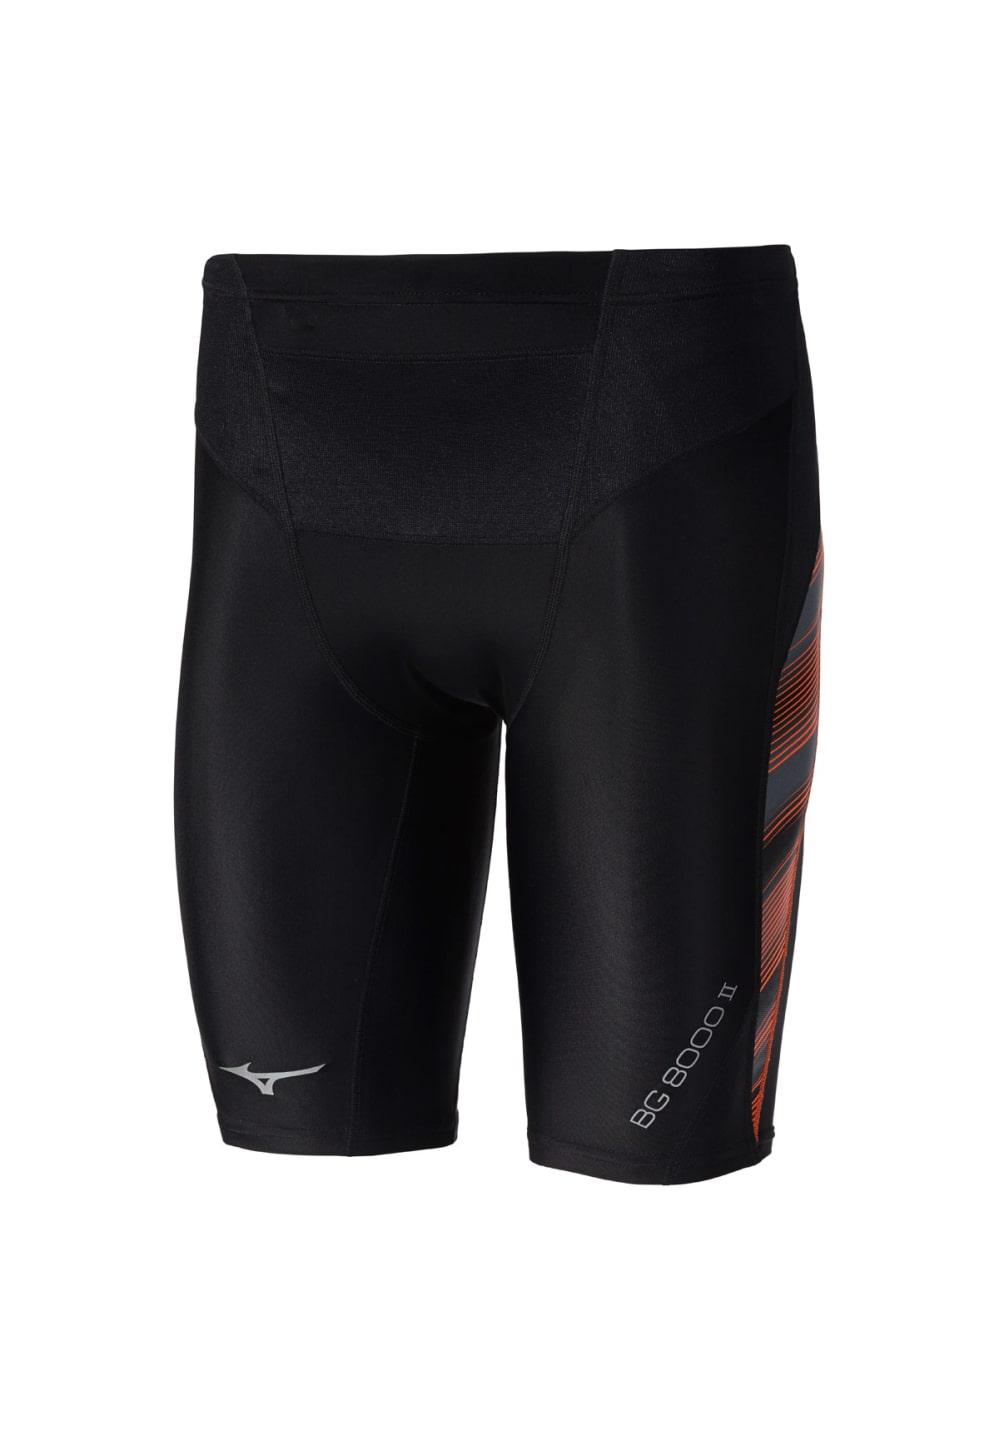 Mizuno BG8000-2 Mid Tights Hommes Pantalons course